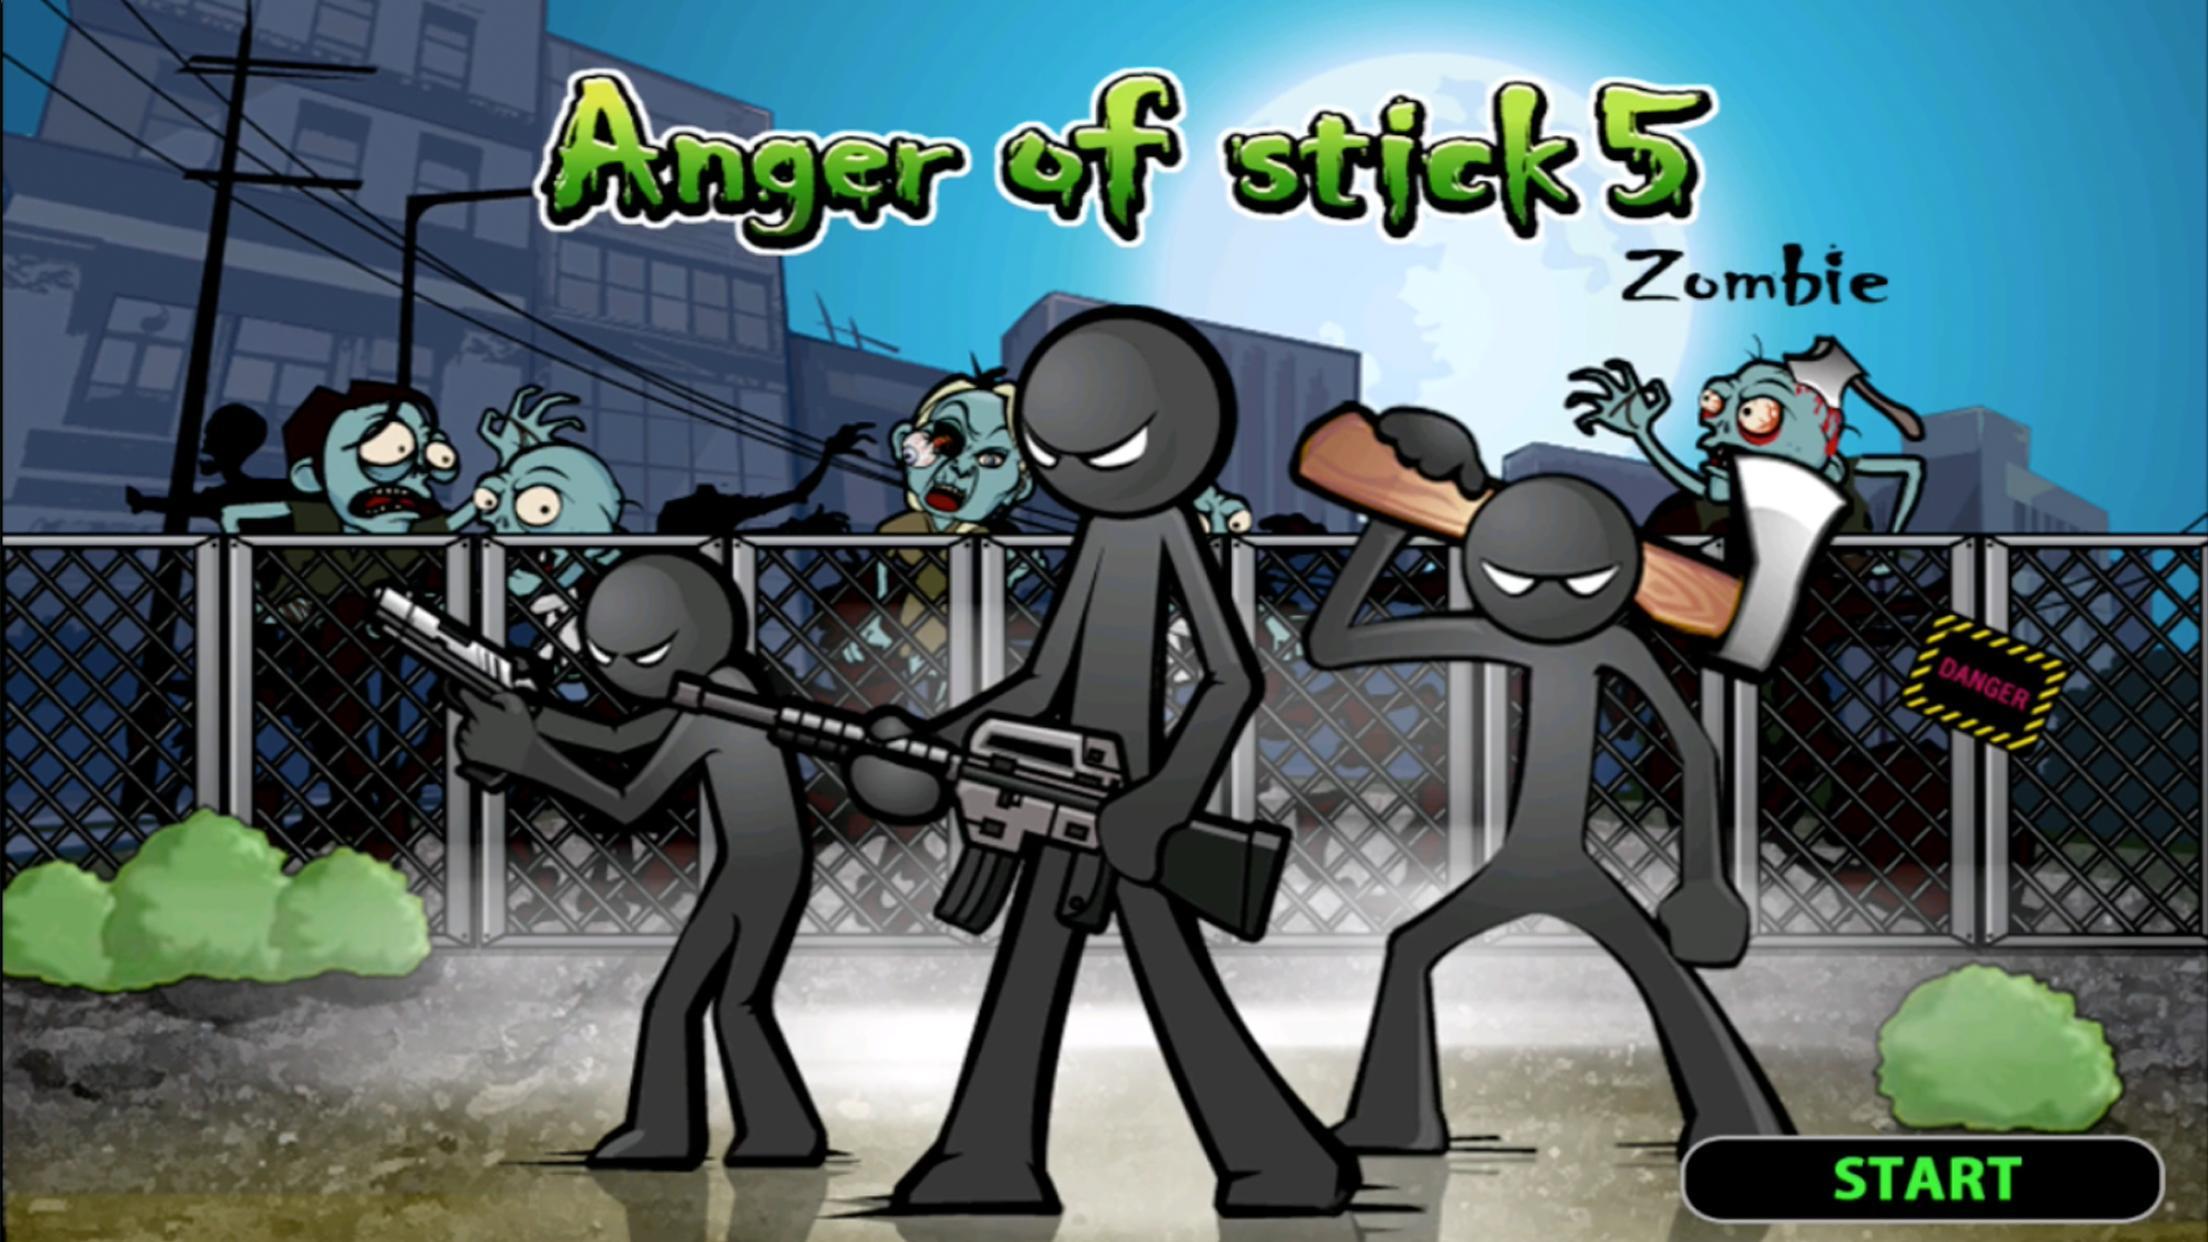 Игра для Андроид Anger of stick 5